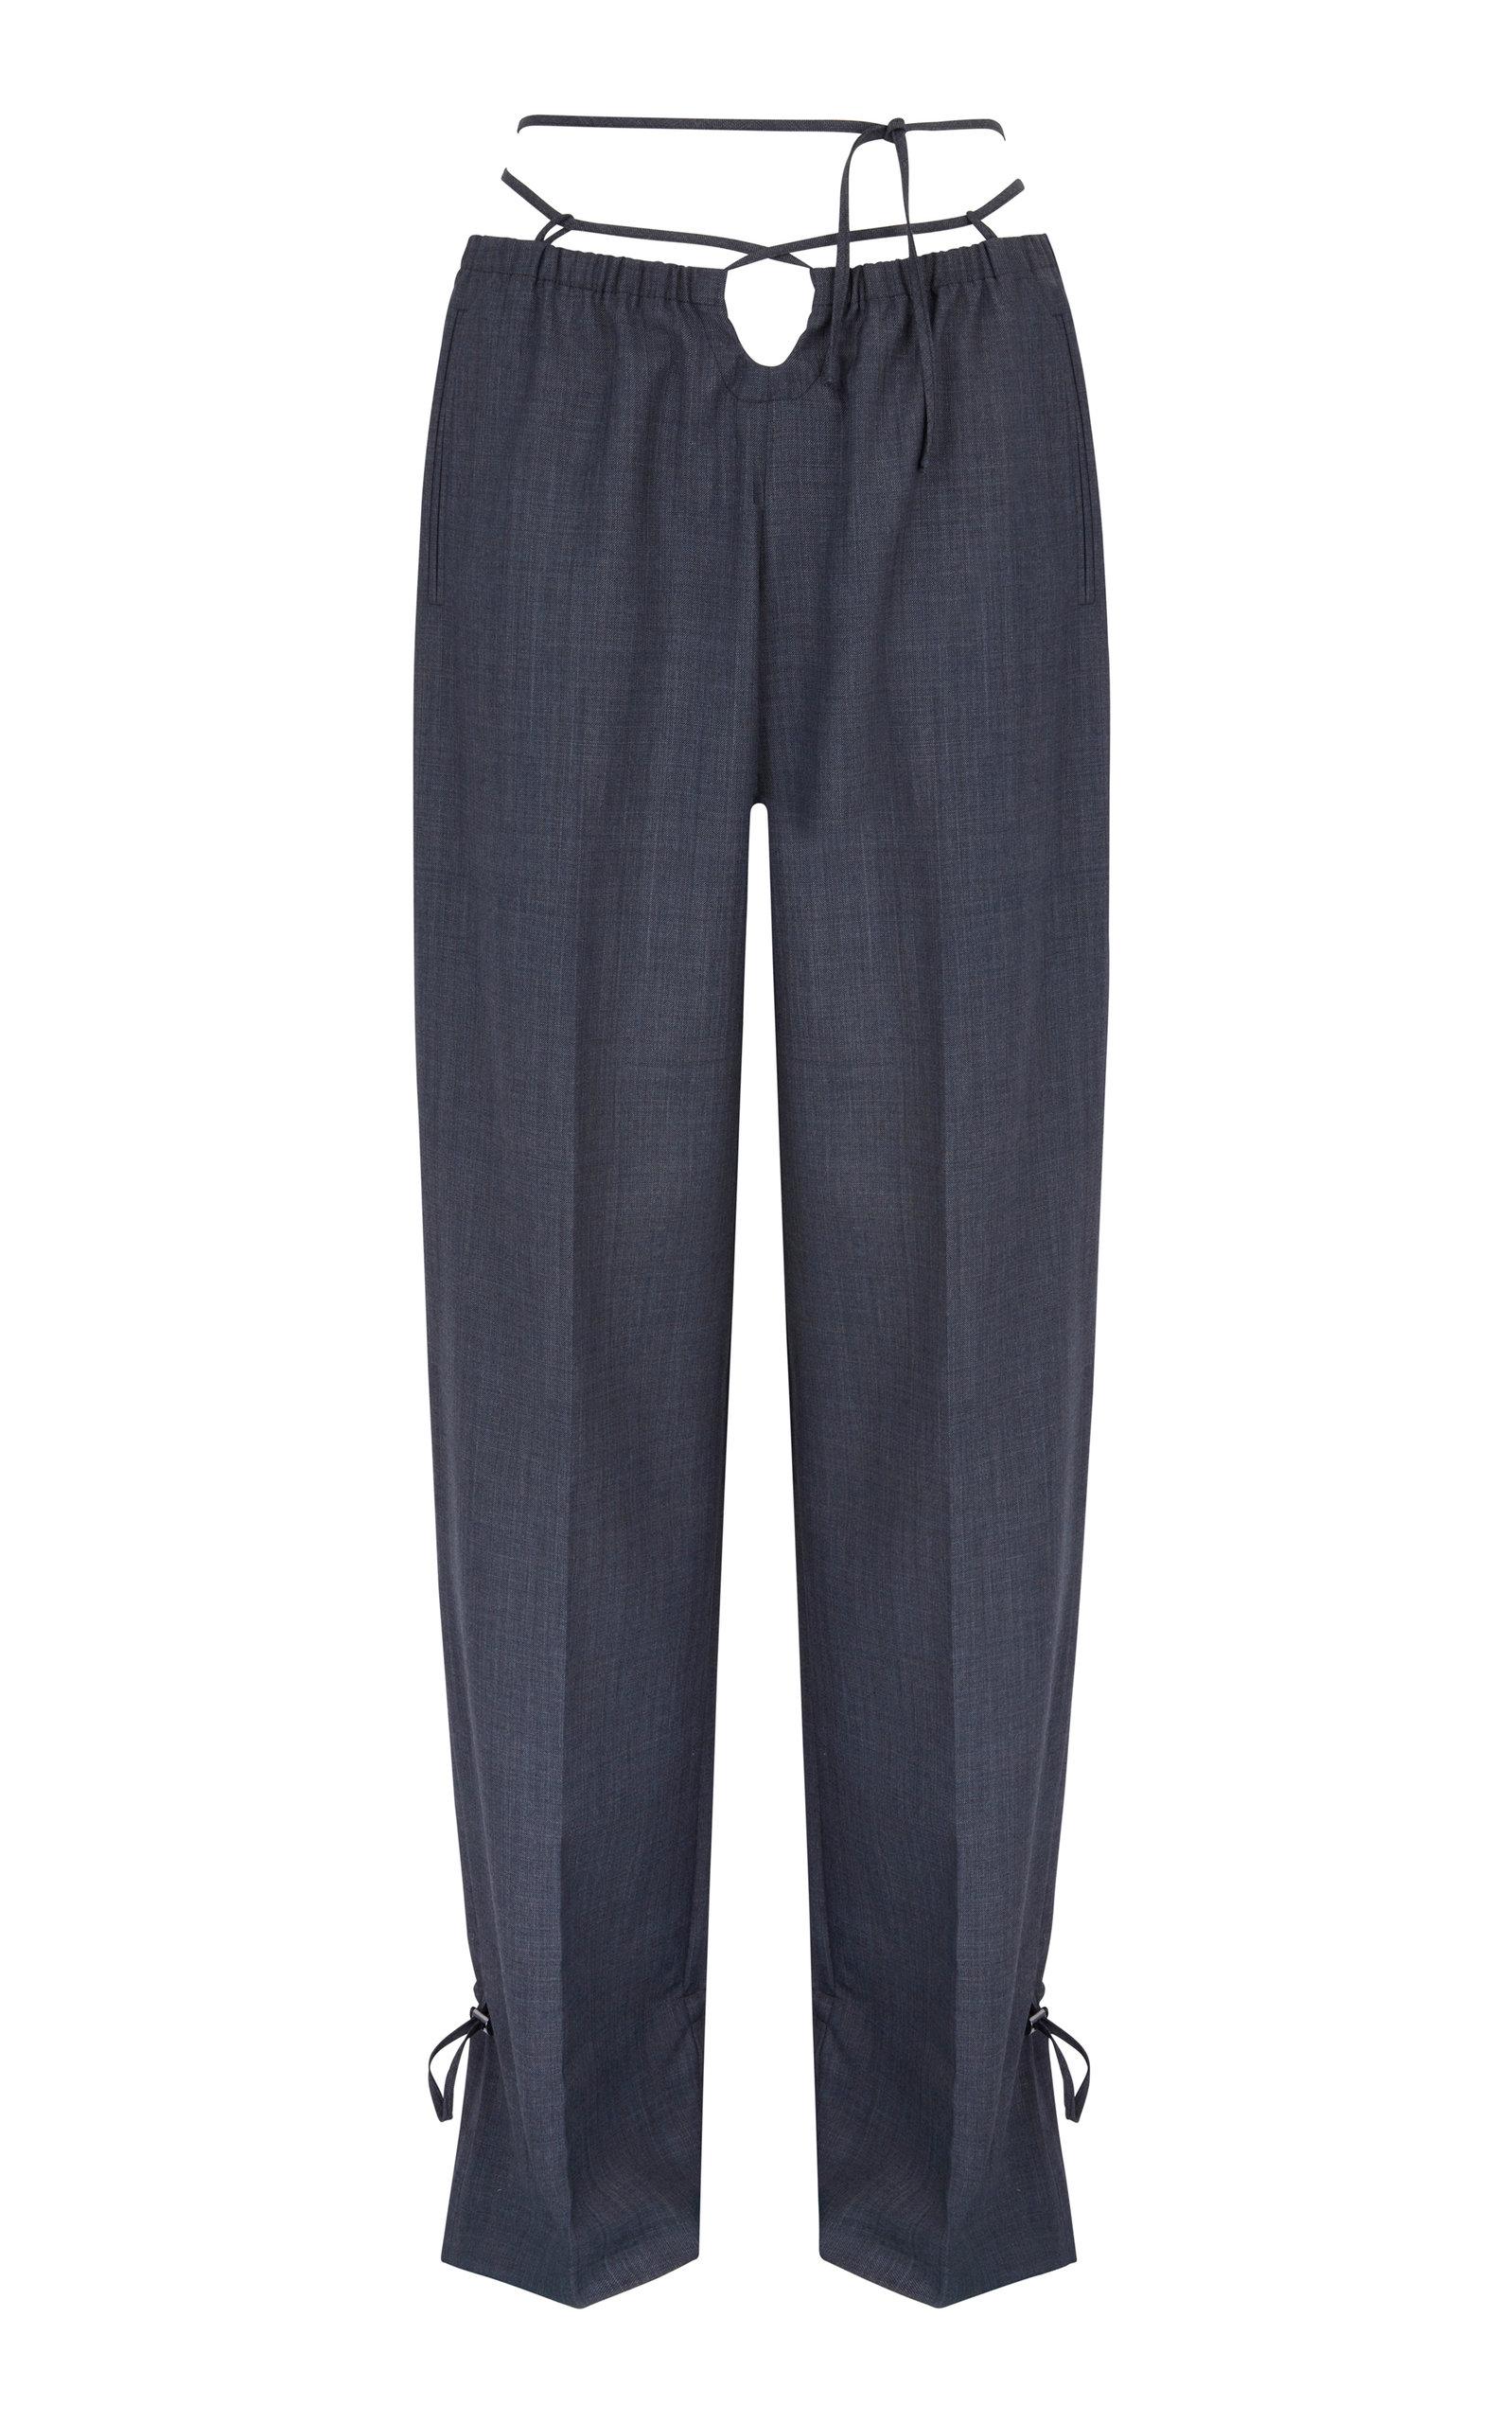 Women's Baojin Tie-Accented Woven Straight-Leg Pants